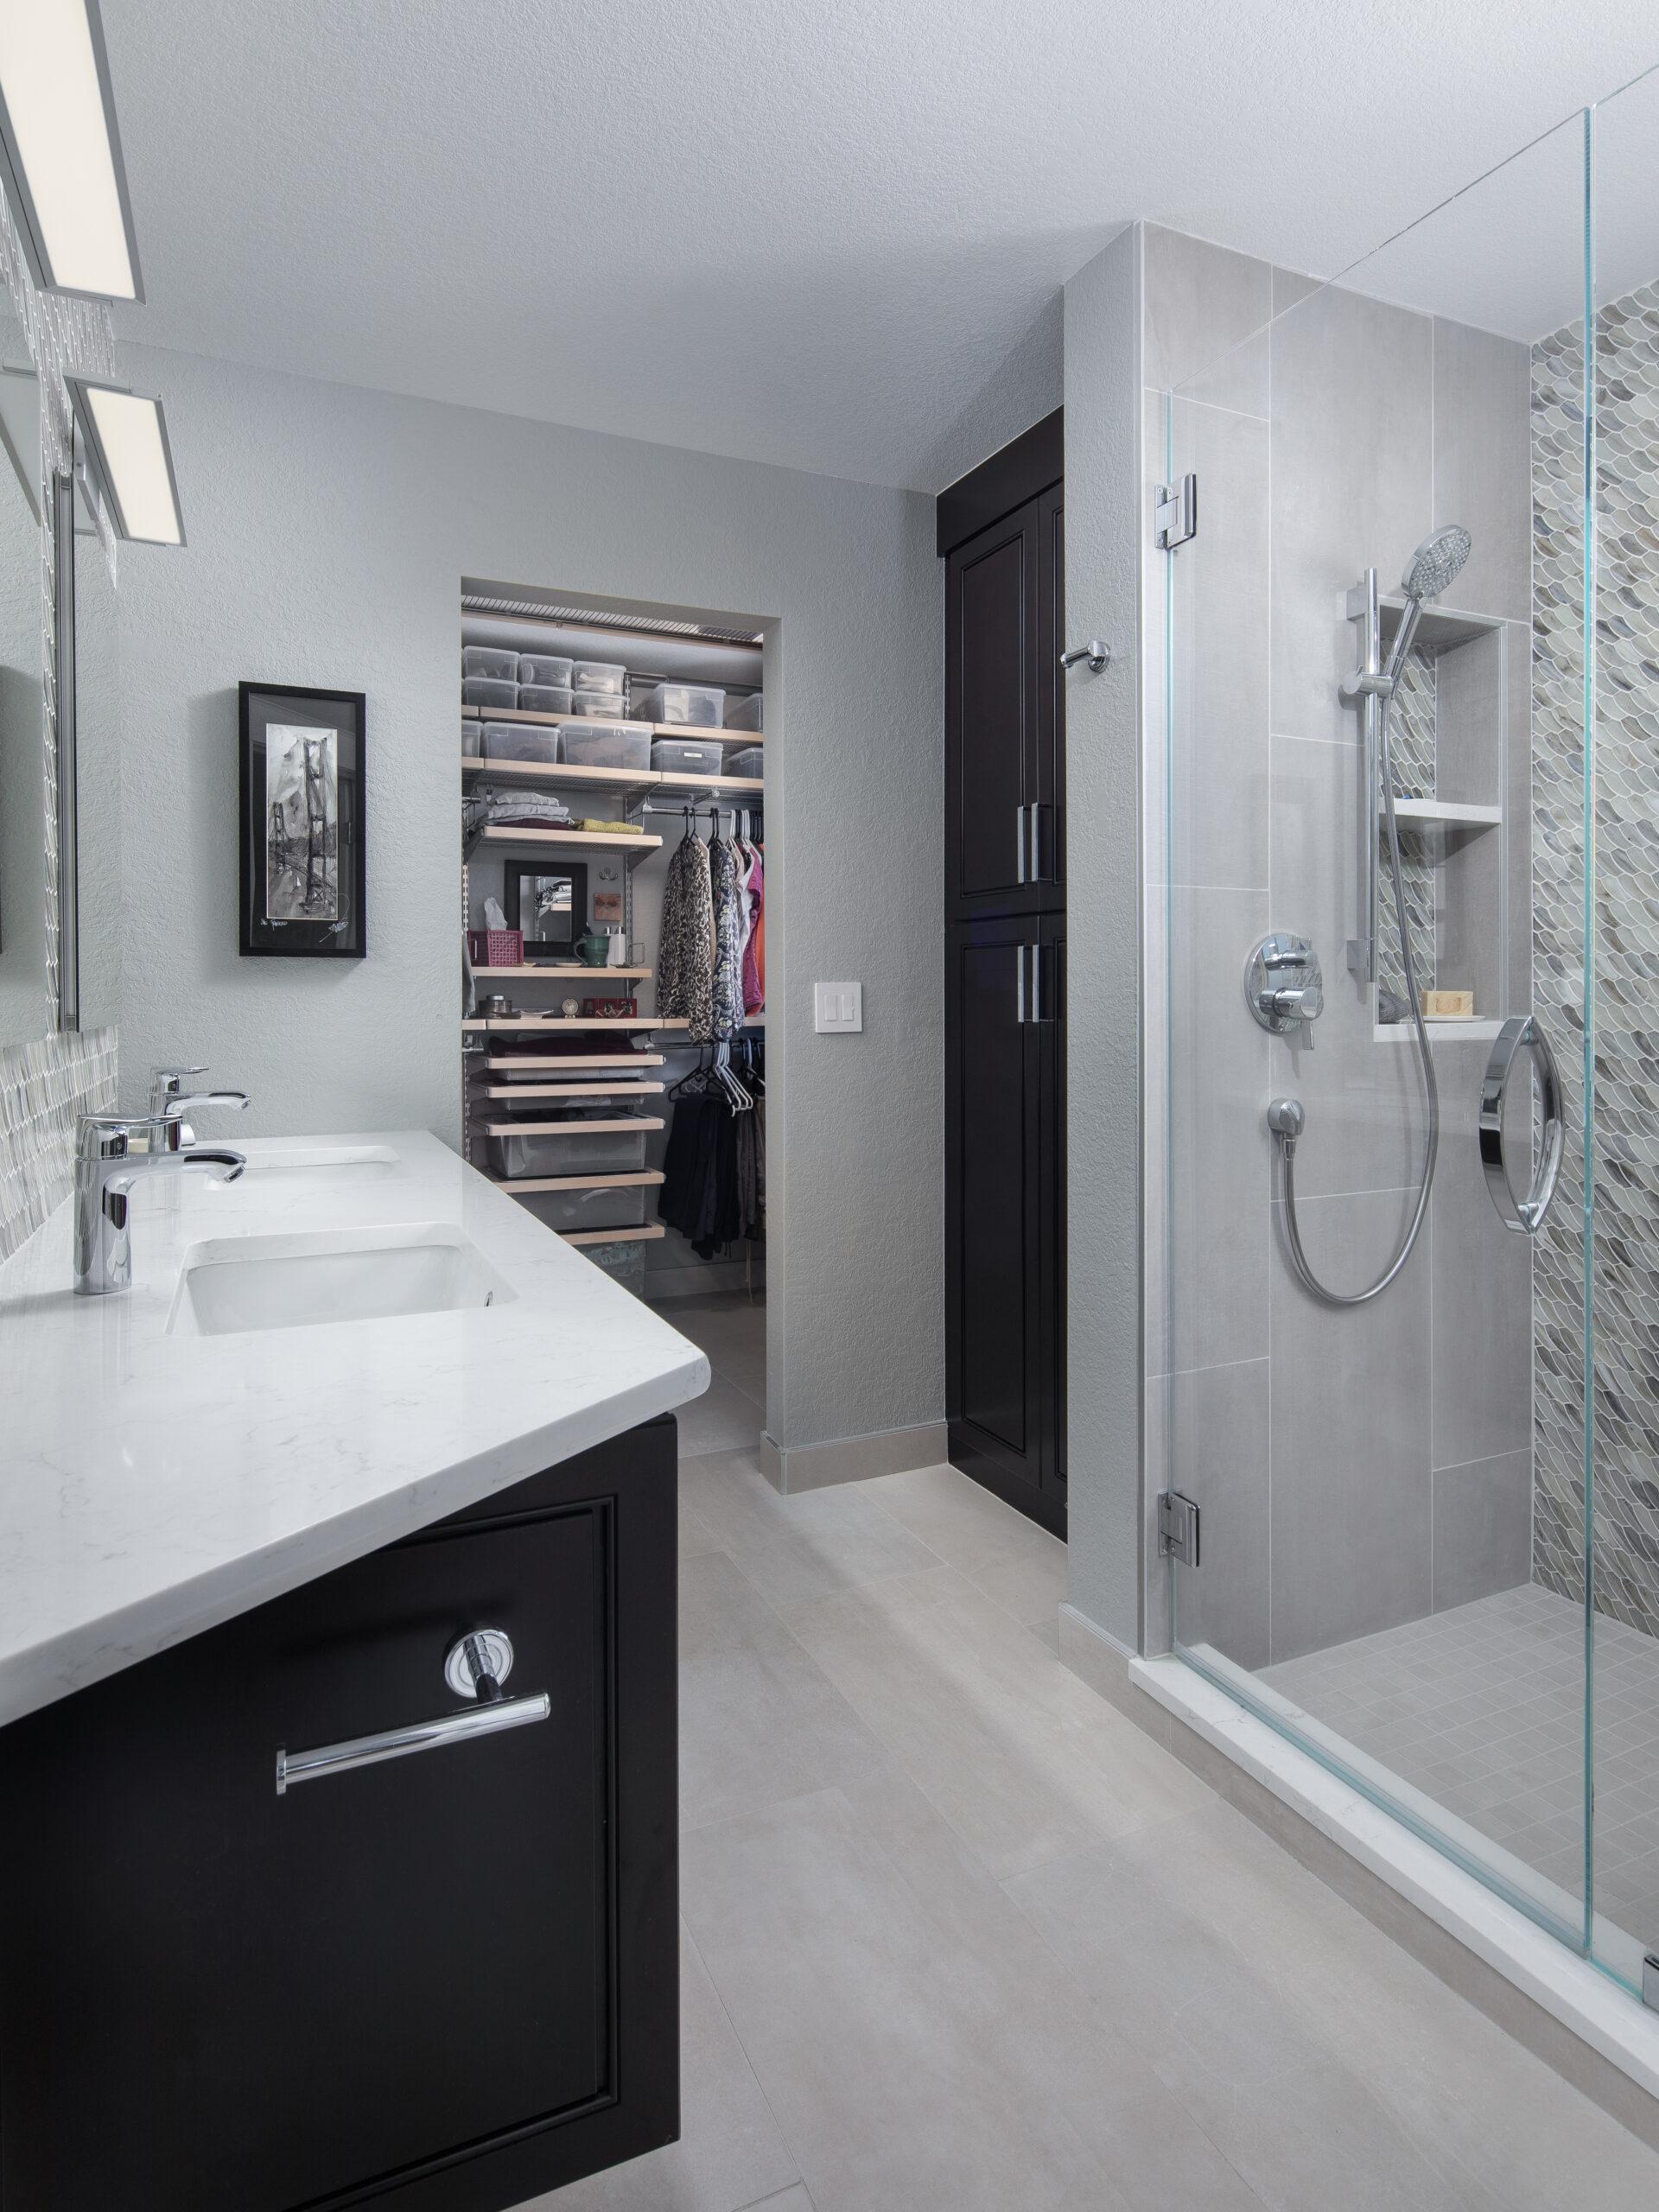 KE Interior Solutions updated master bathroom